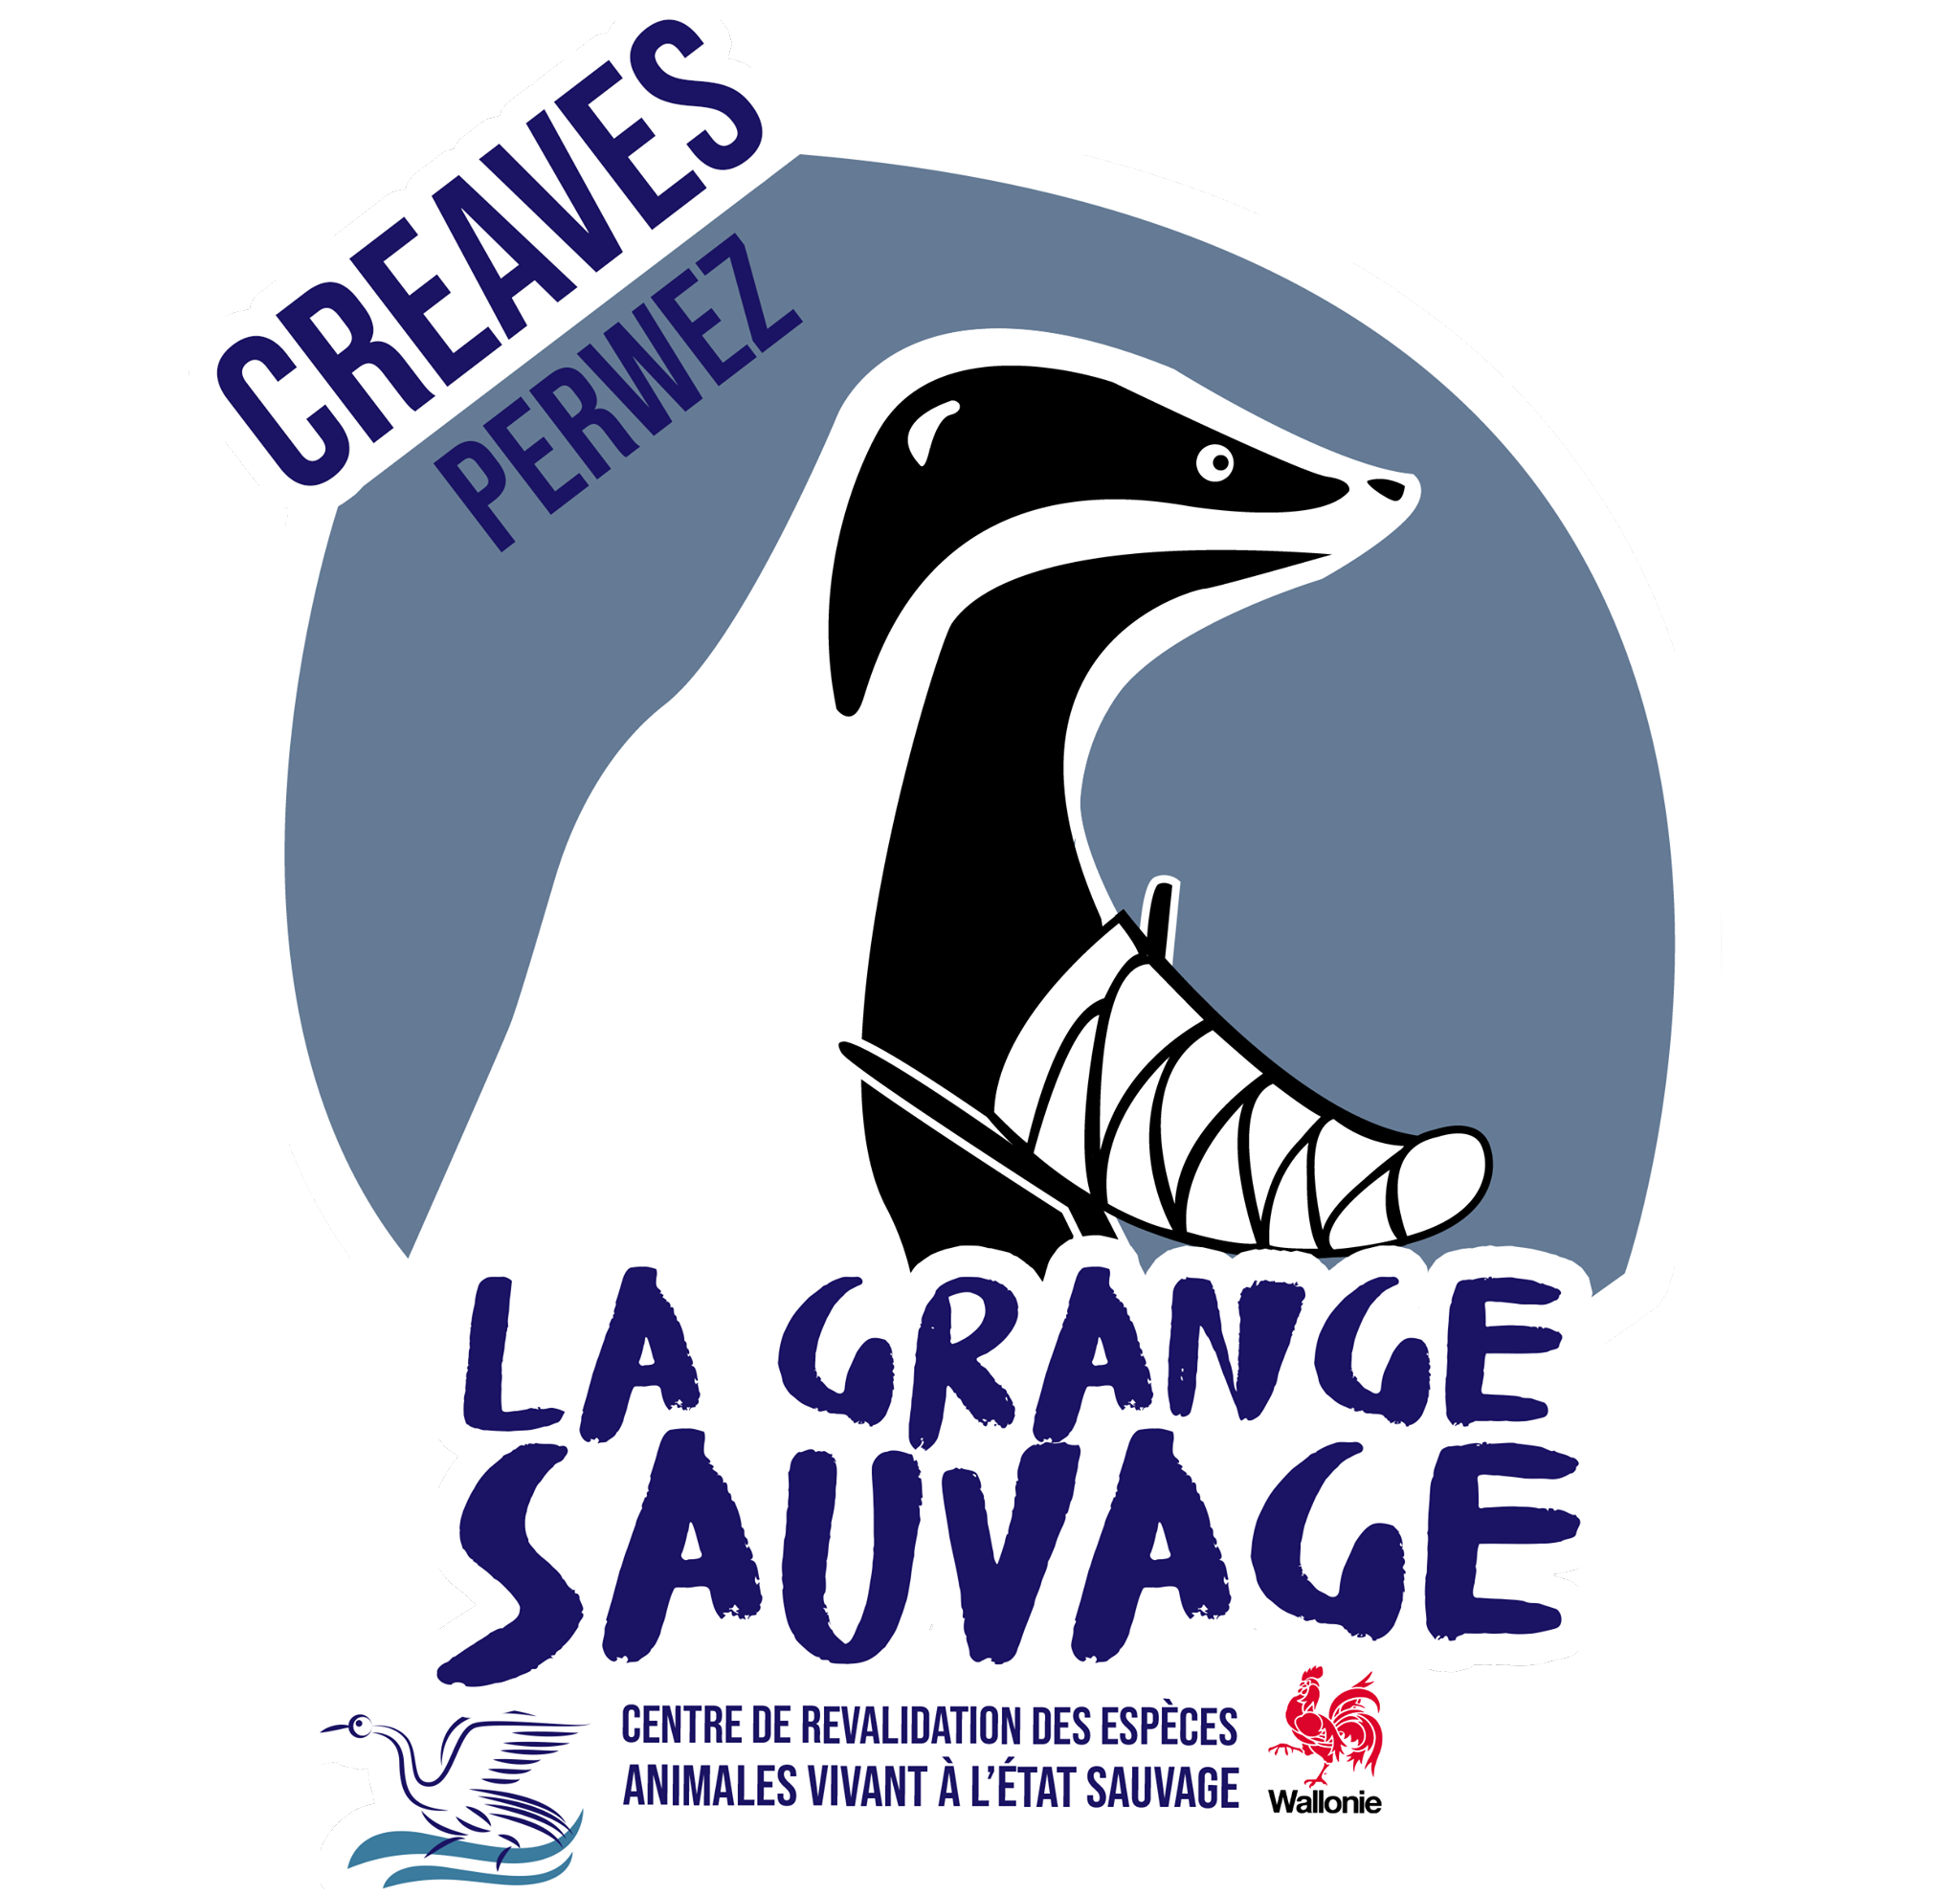 La Grange Sauvage